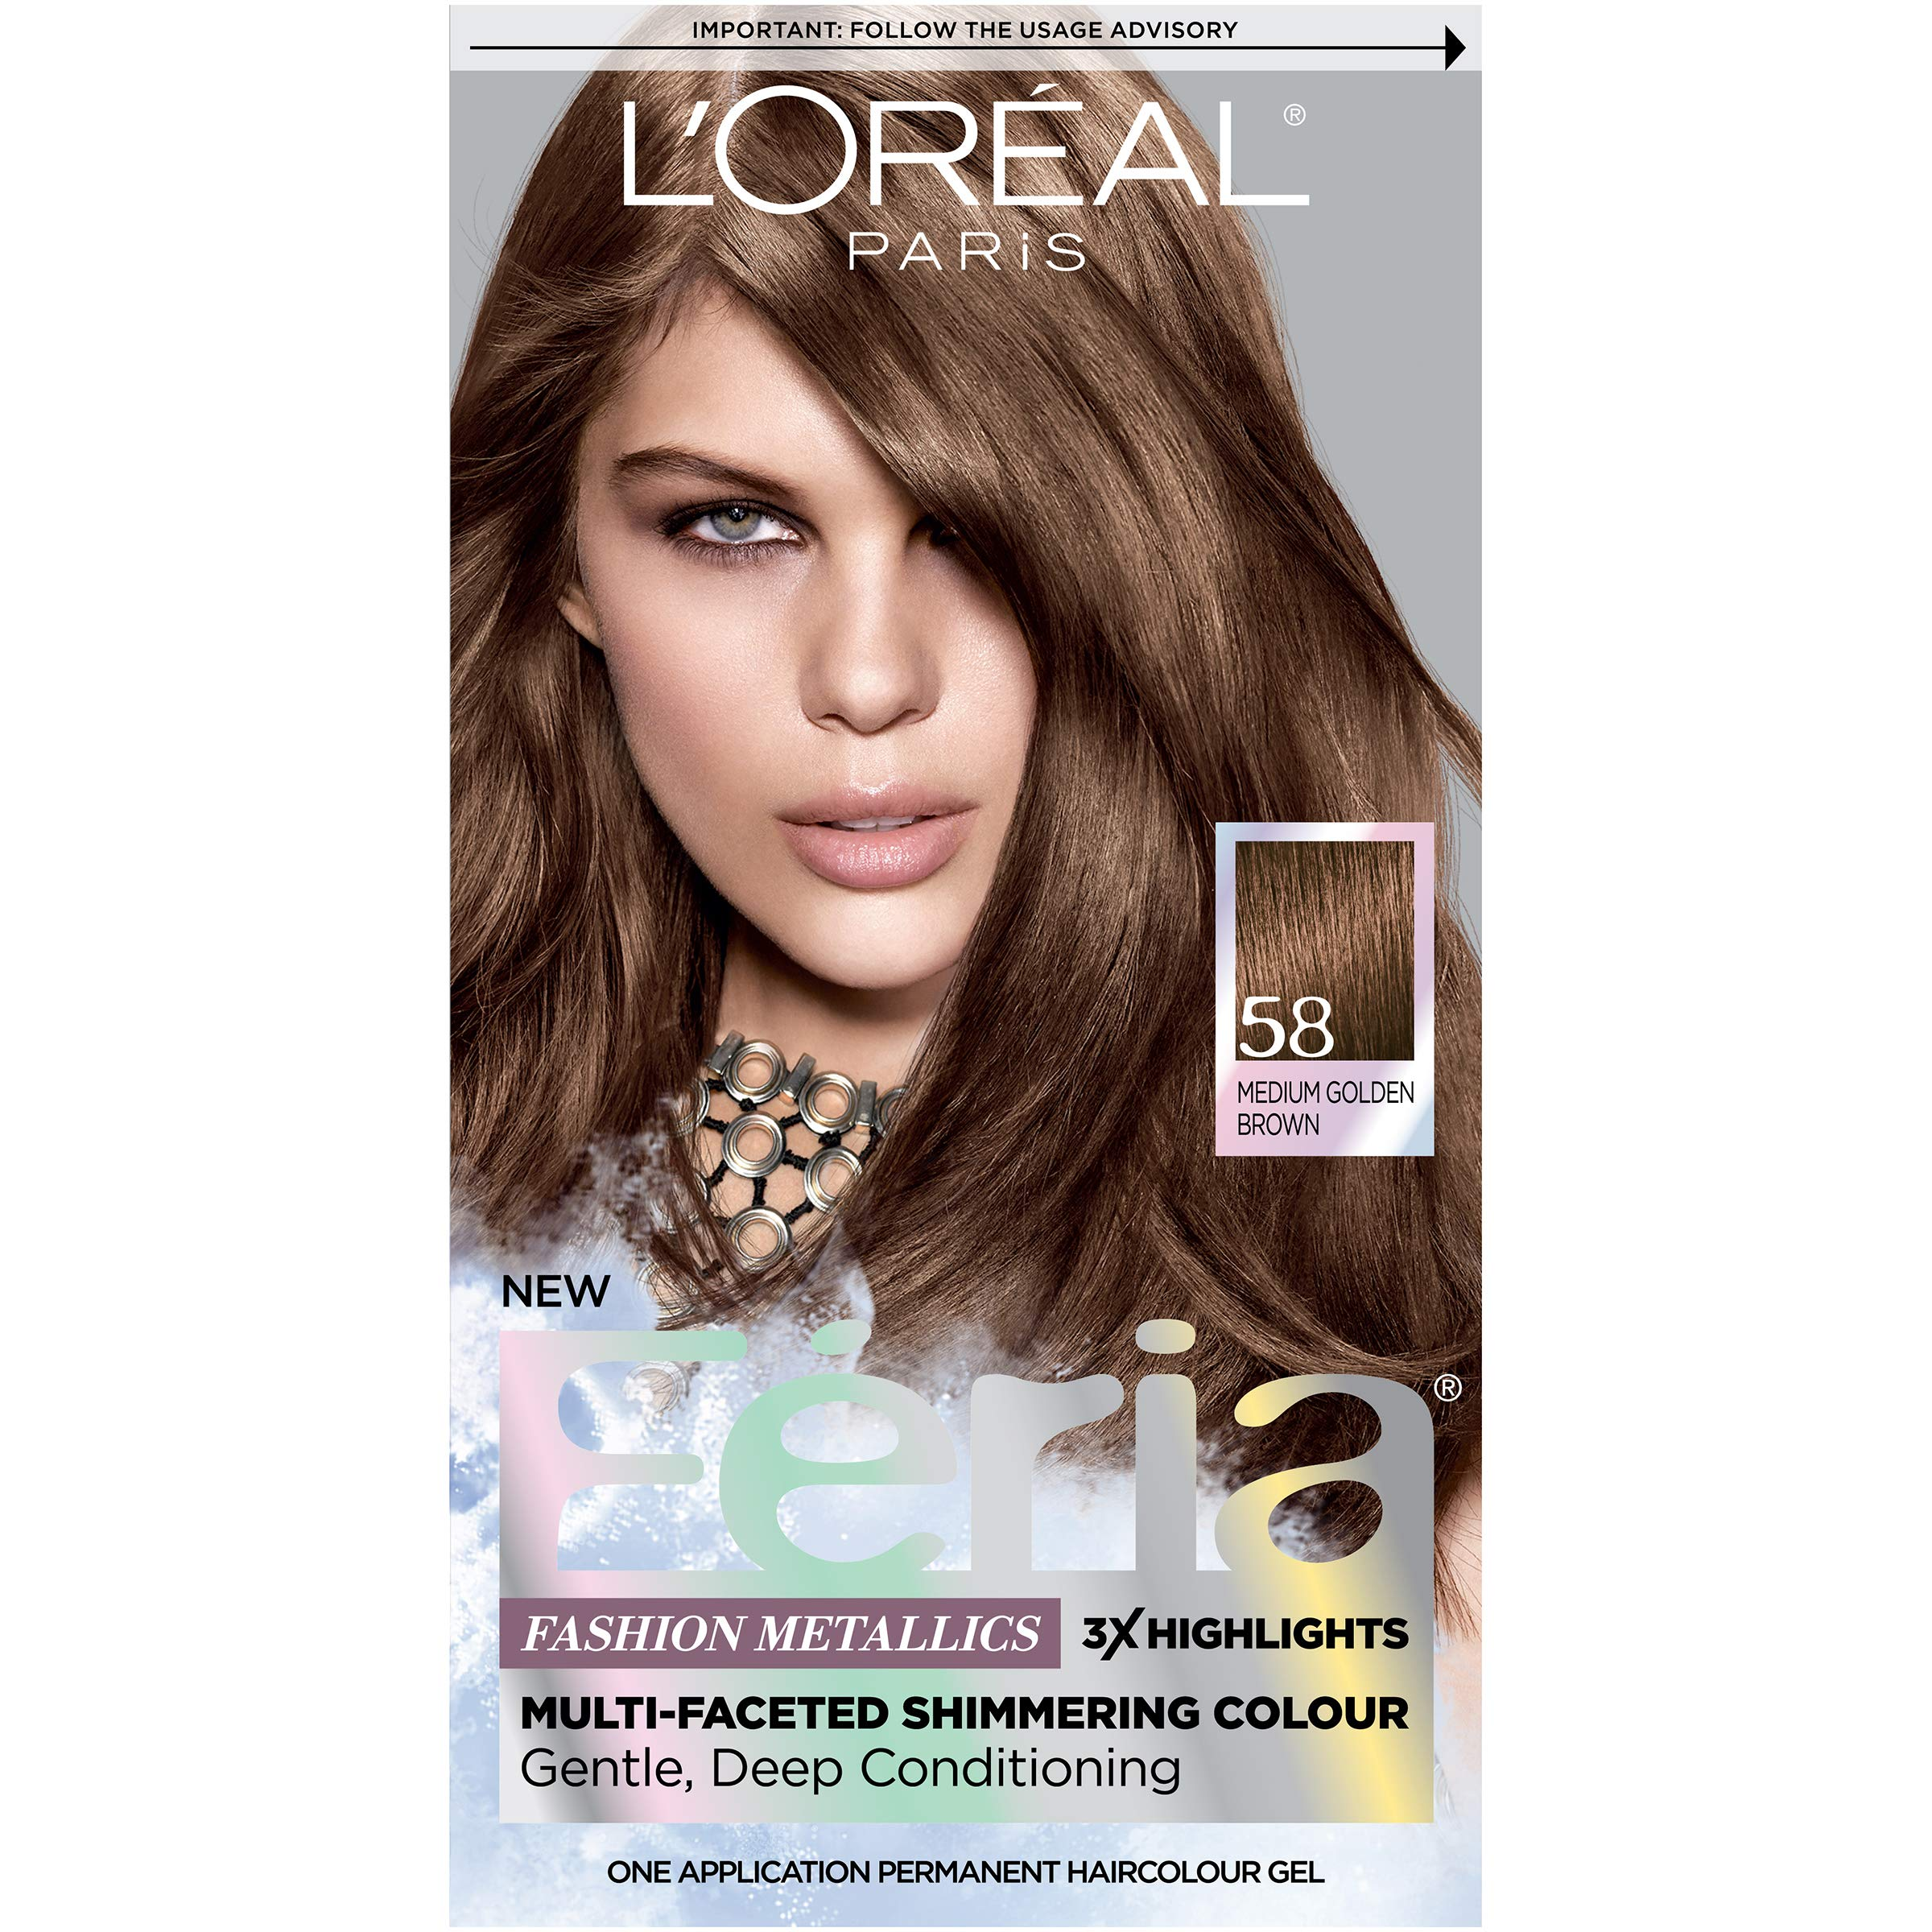 L'Oréal Paris Feria Multi-Faceted Shimmering Permanent Hair Color, 58 Bronze Shimmer (Medium Golden Brown), 1 kit Hair Dye